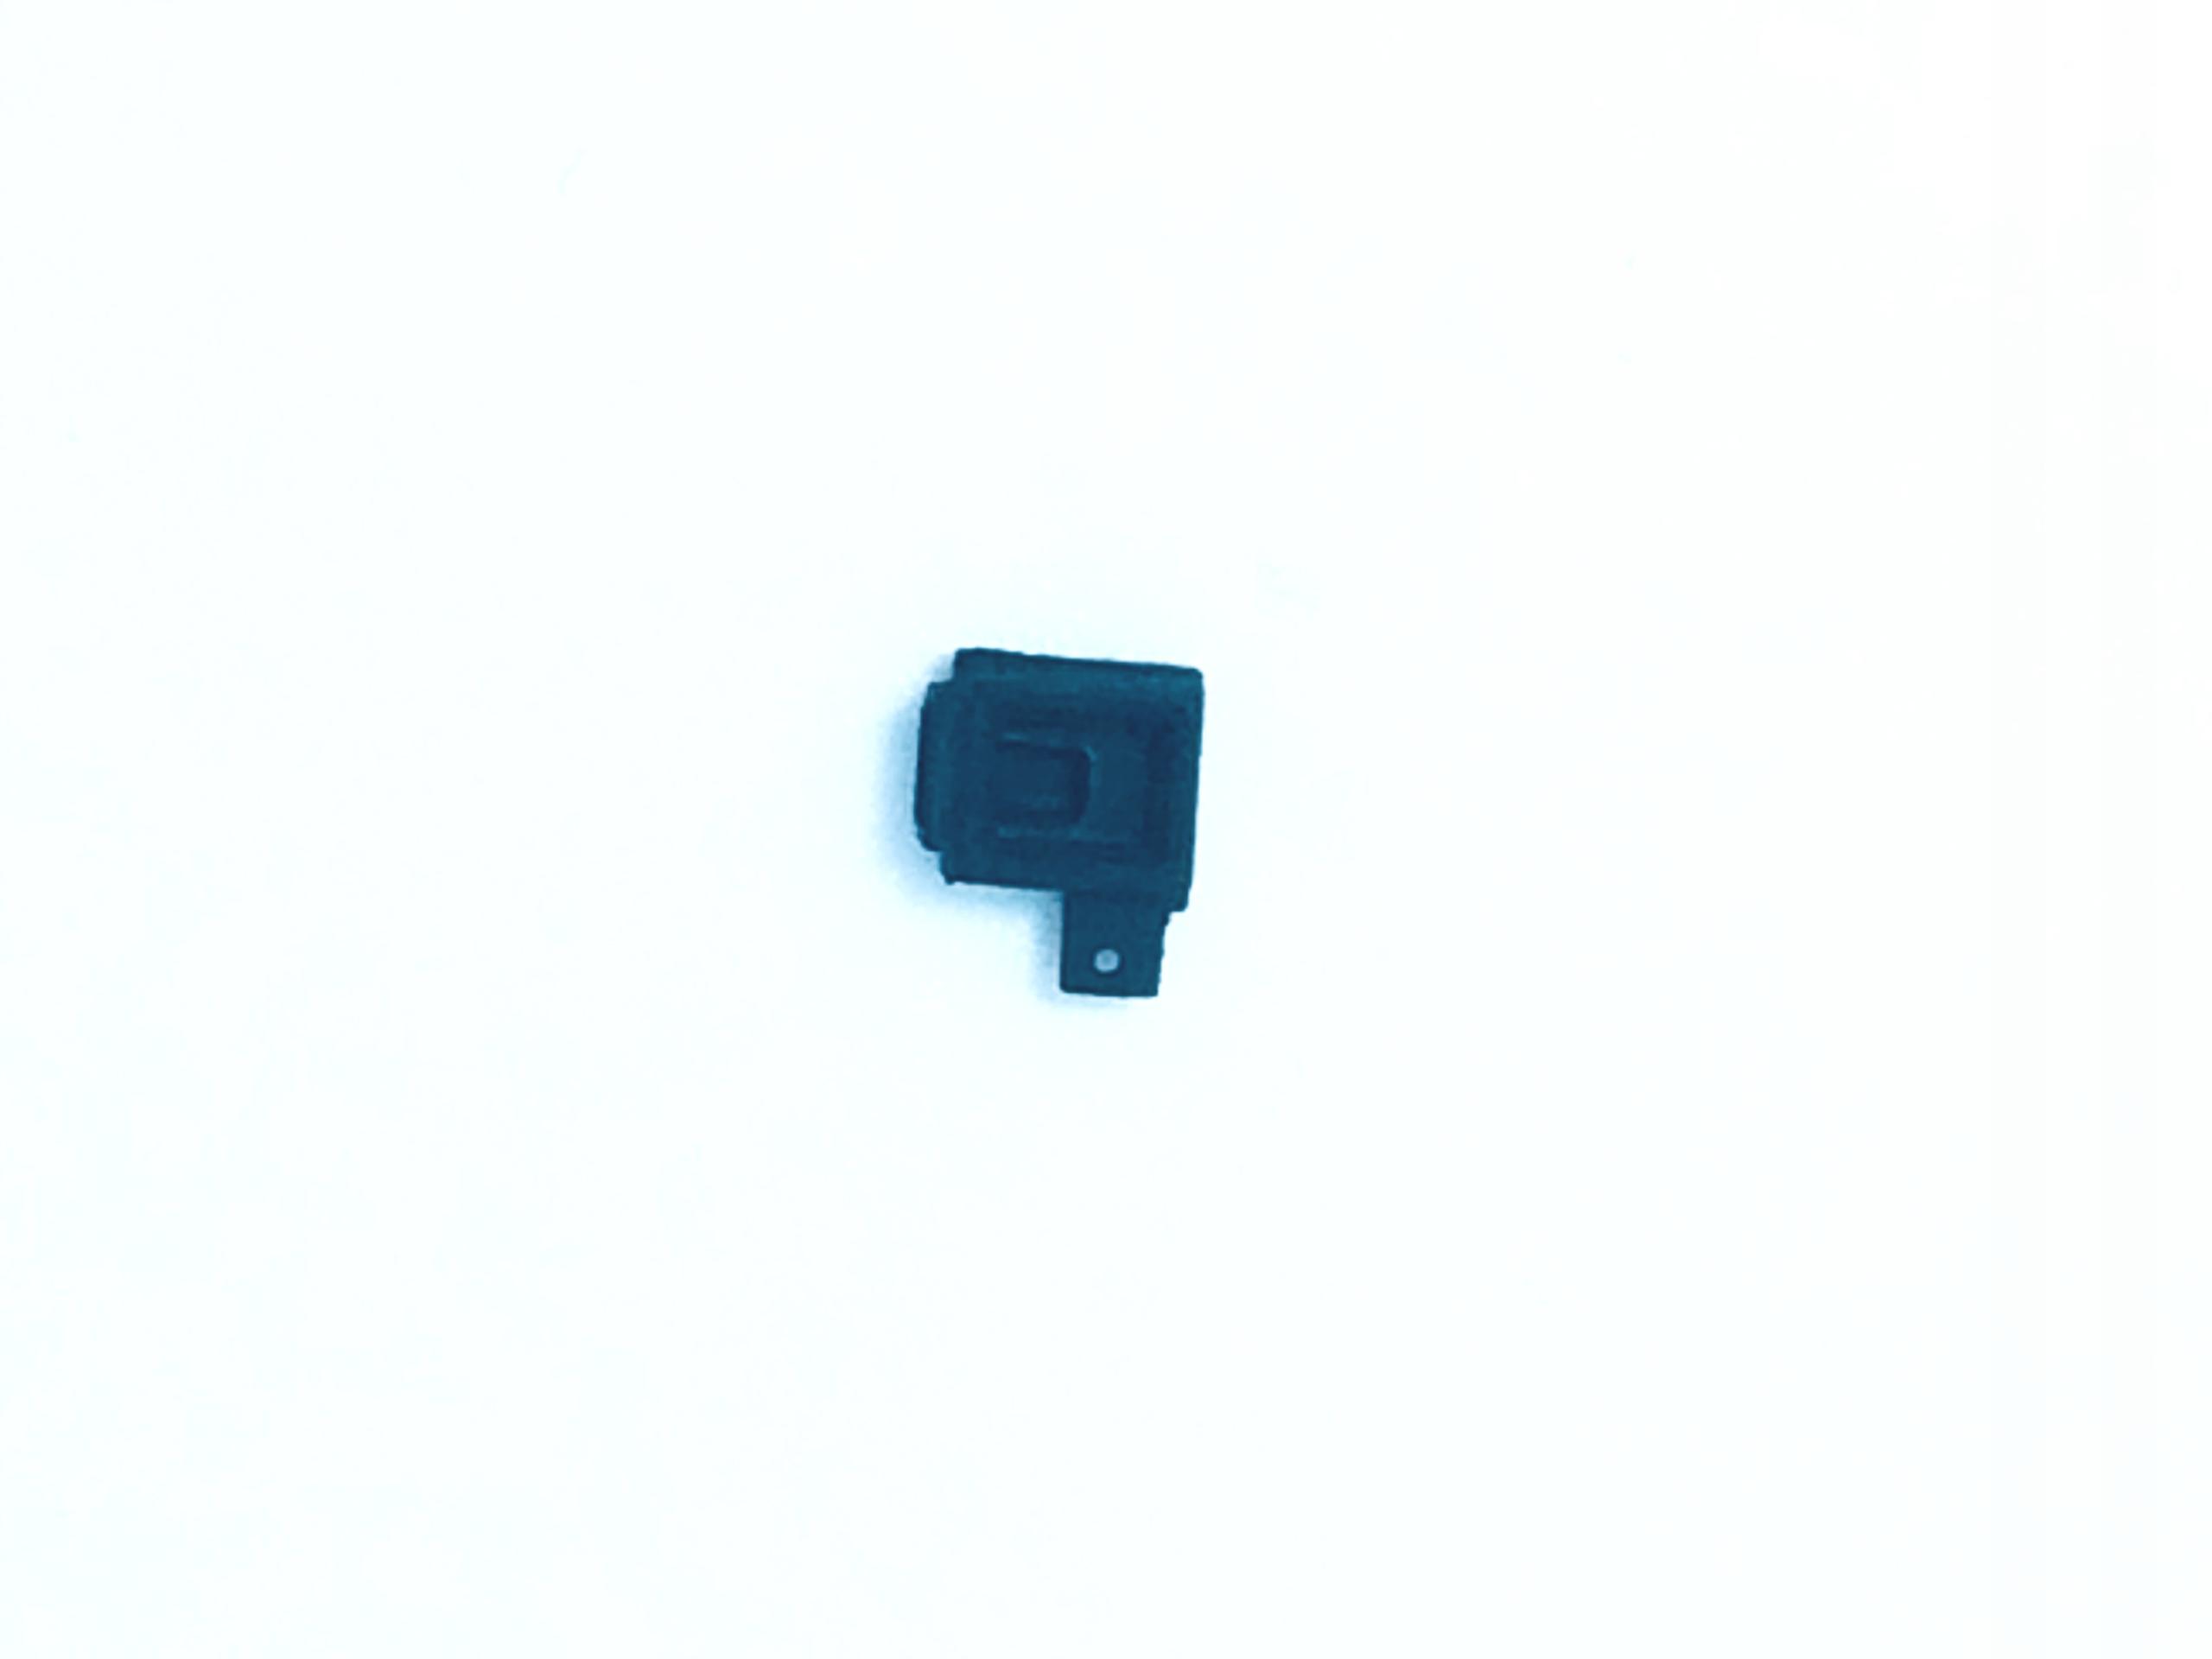 ORG GUMKA NA MIKROFON HUAWEI P9 LITE VNS-L21 23%